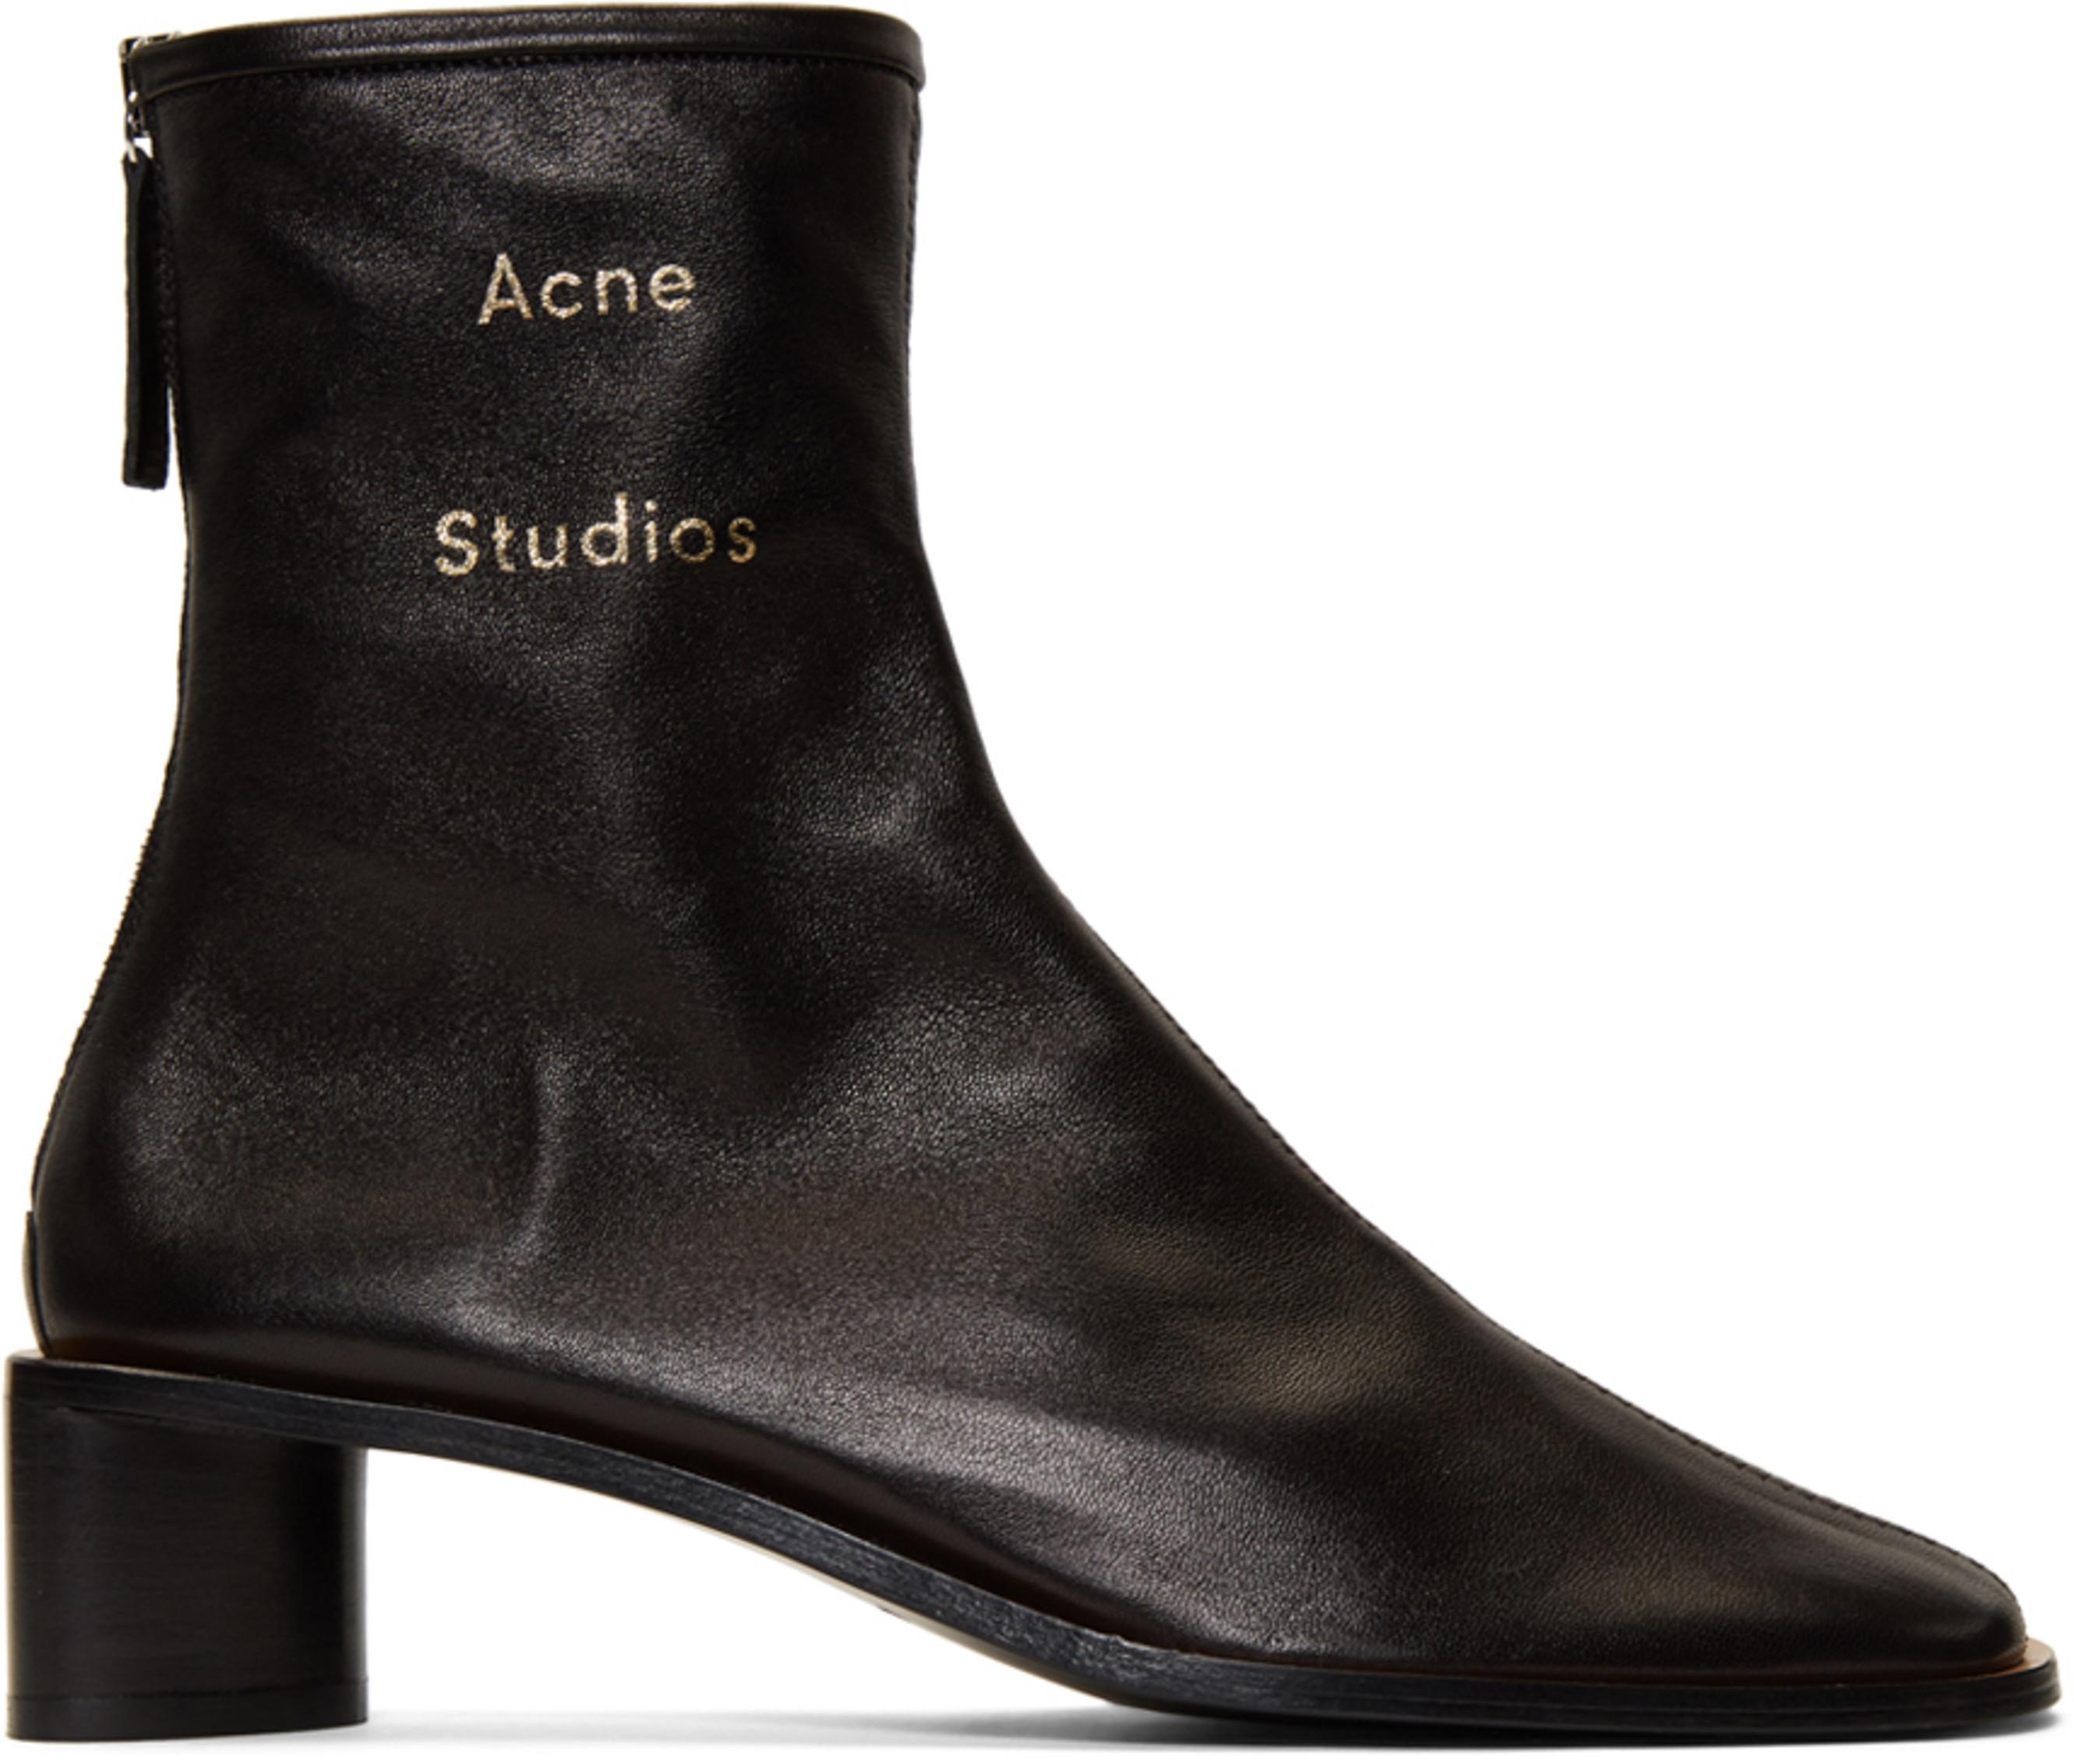 c43ab8c67a87 Designer shoes for Women